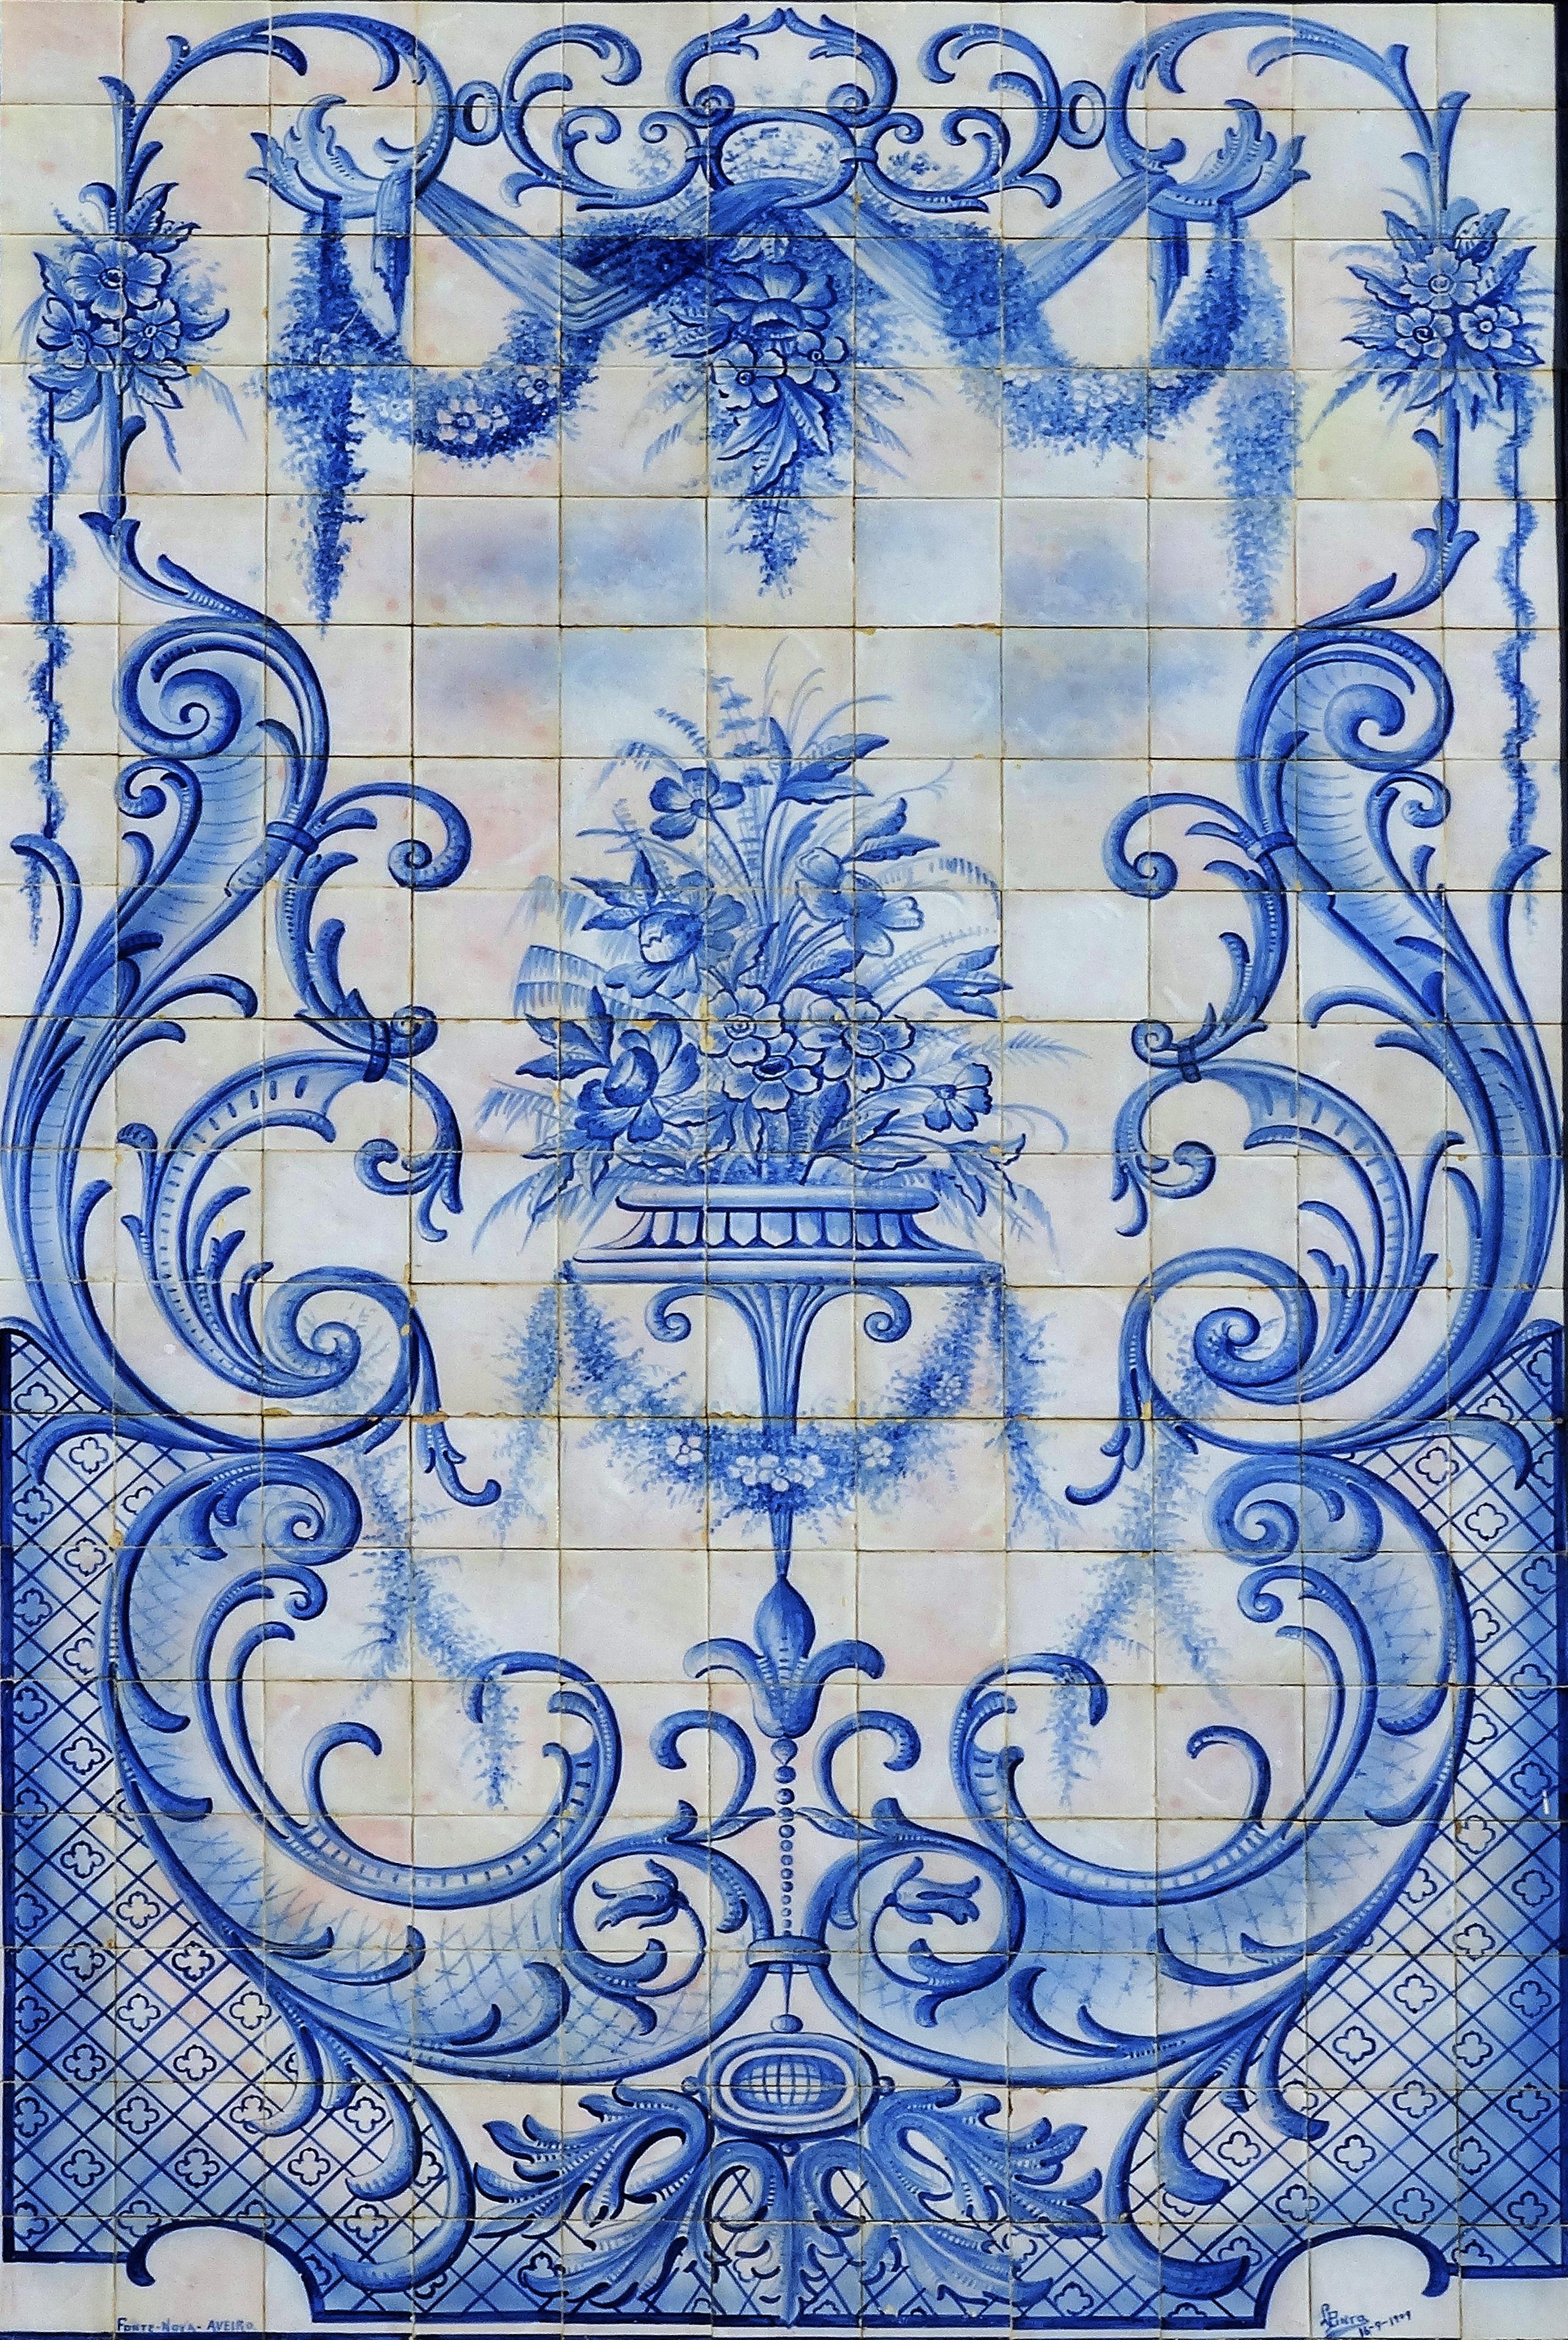 Fotos Gratis Patron Azulejo Azul Material Textil Art - Azulejos-con-dibujos